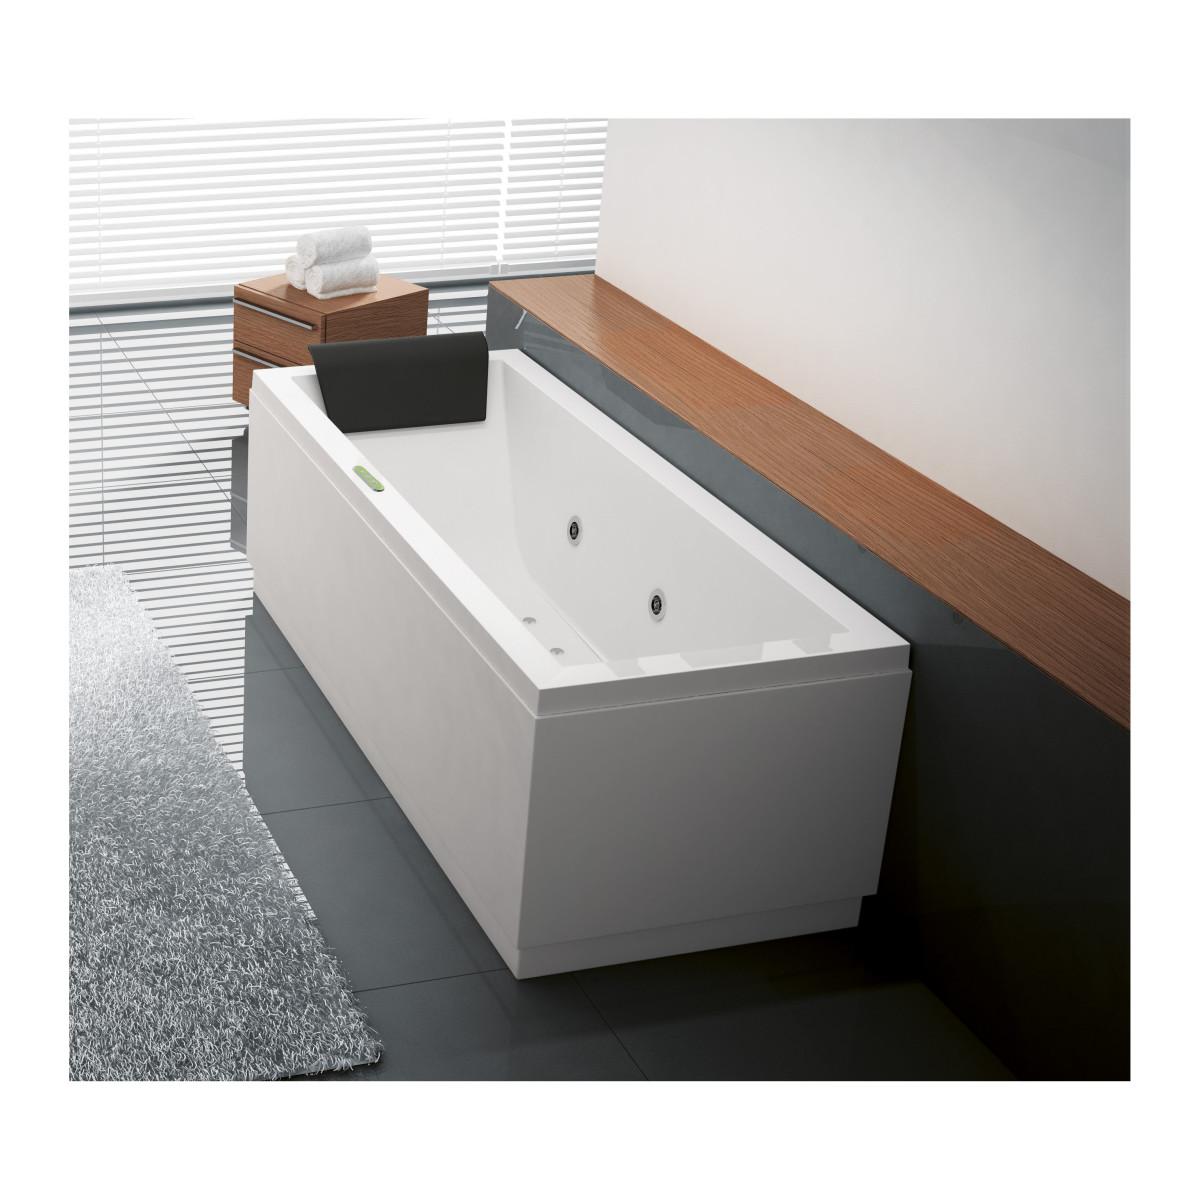 Doccia vasca prezzi - Vasche da bagno leroy merlin ...